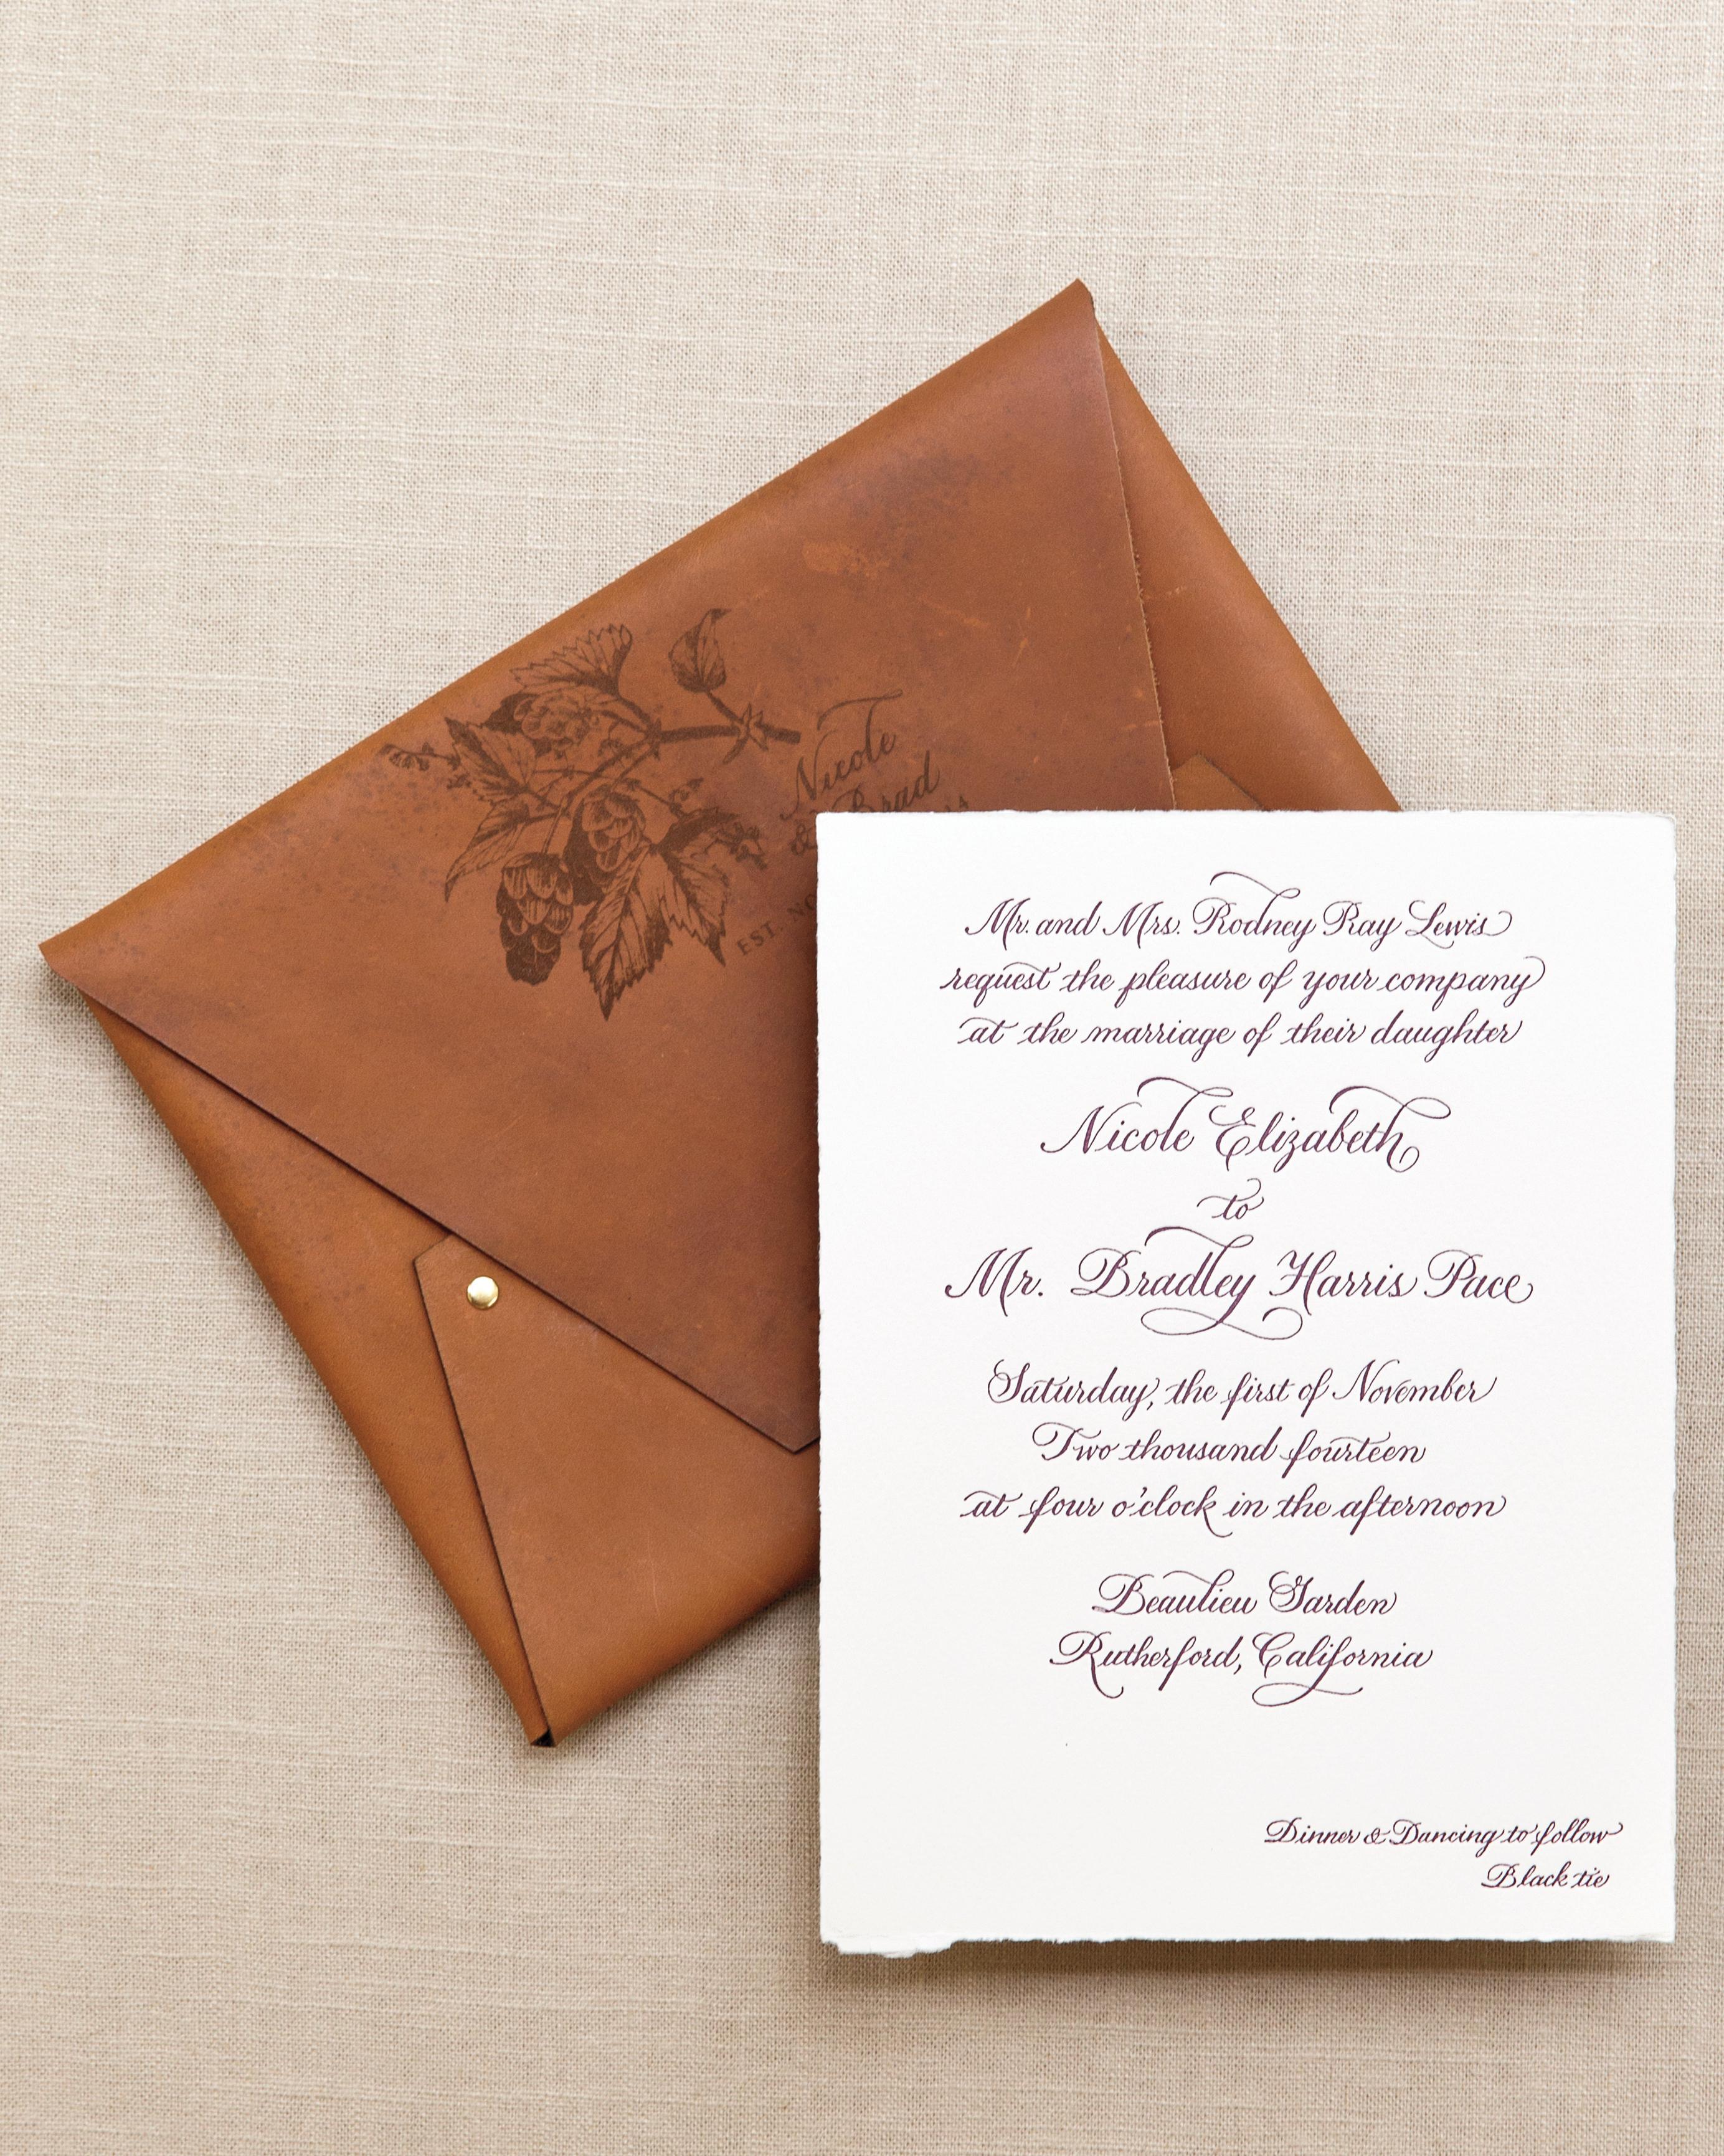 nicole-bradley-napa-california-wedding-invite-s112349.jpg